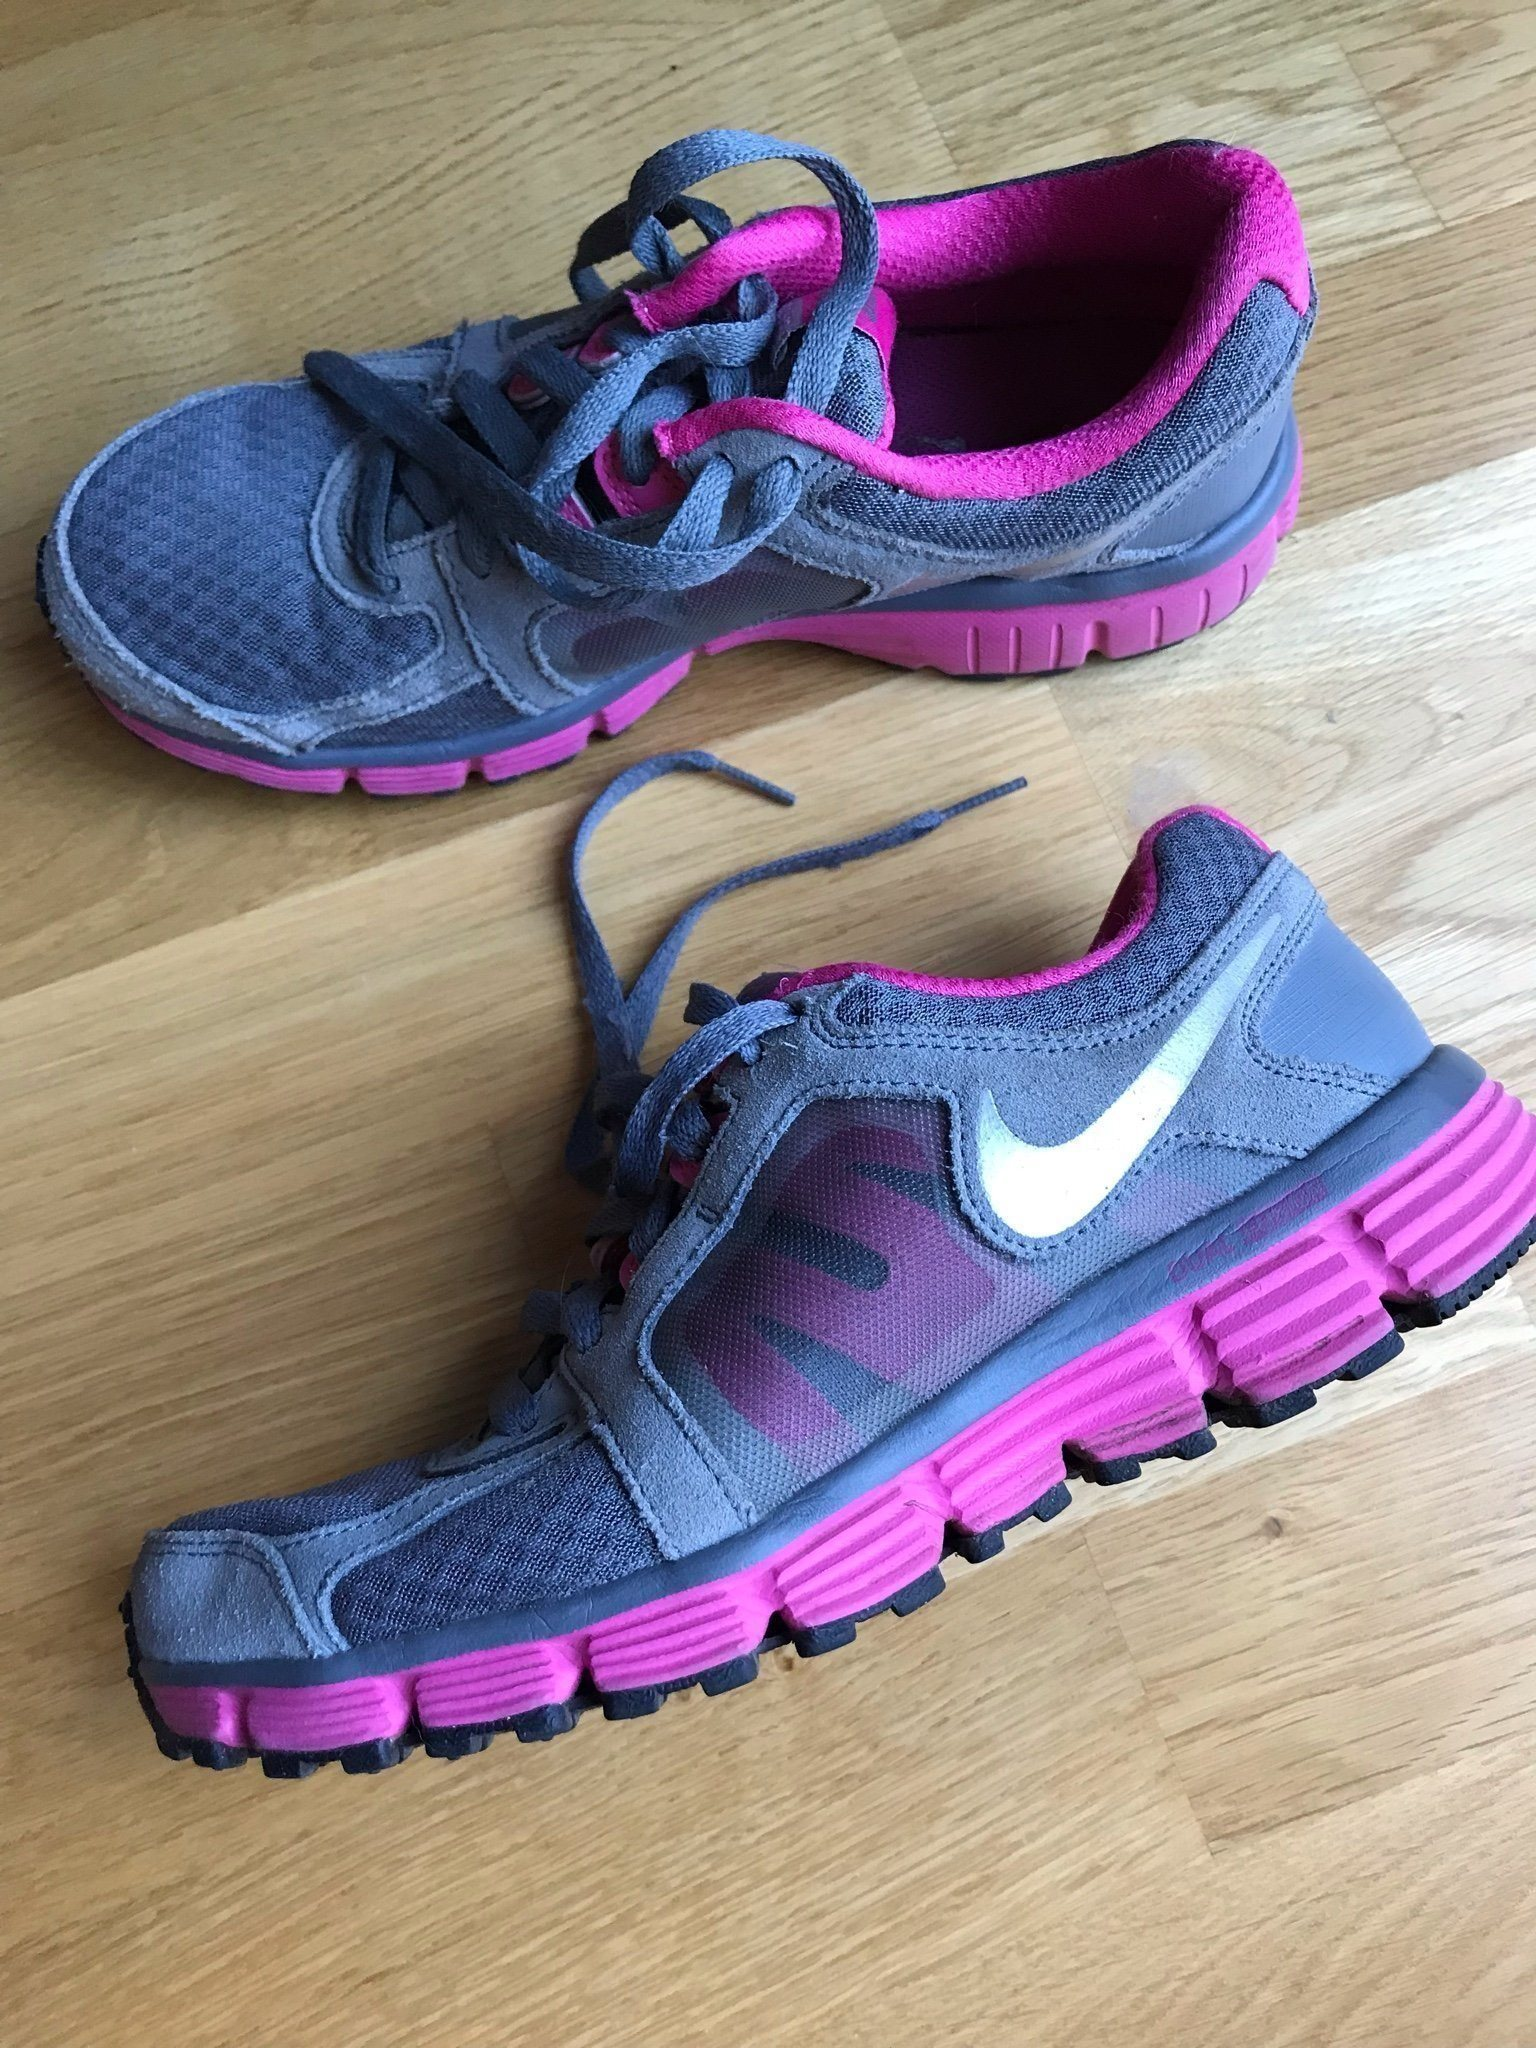 new product ef6a3 aea5c Nike skor storlek 38,5 dam